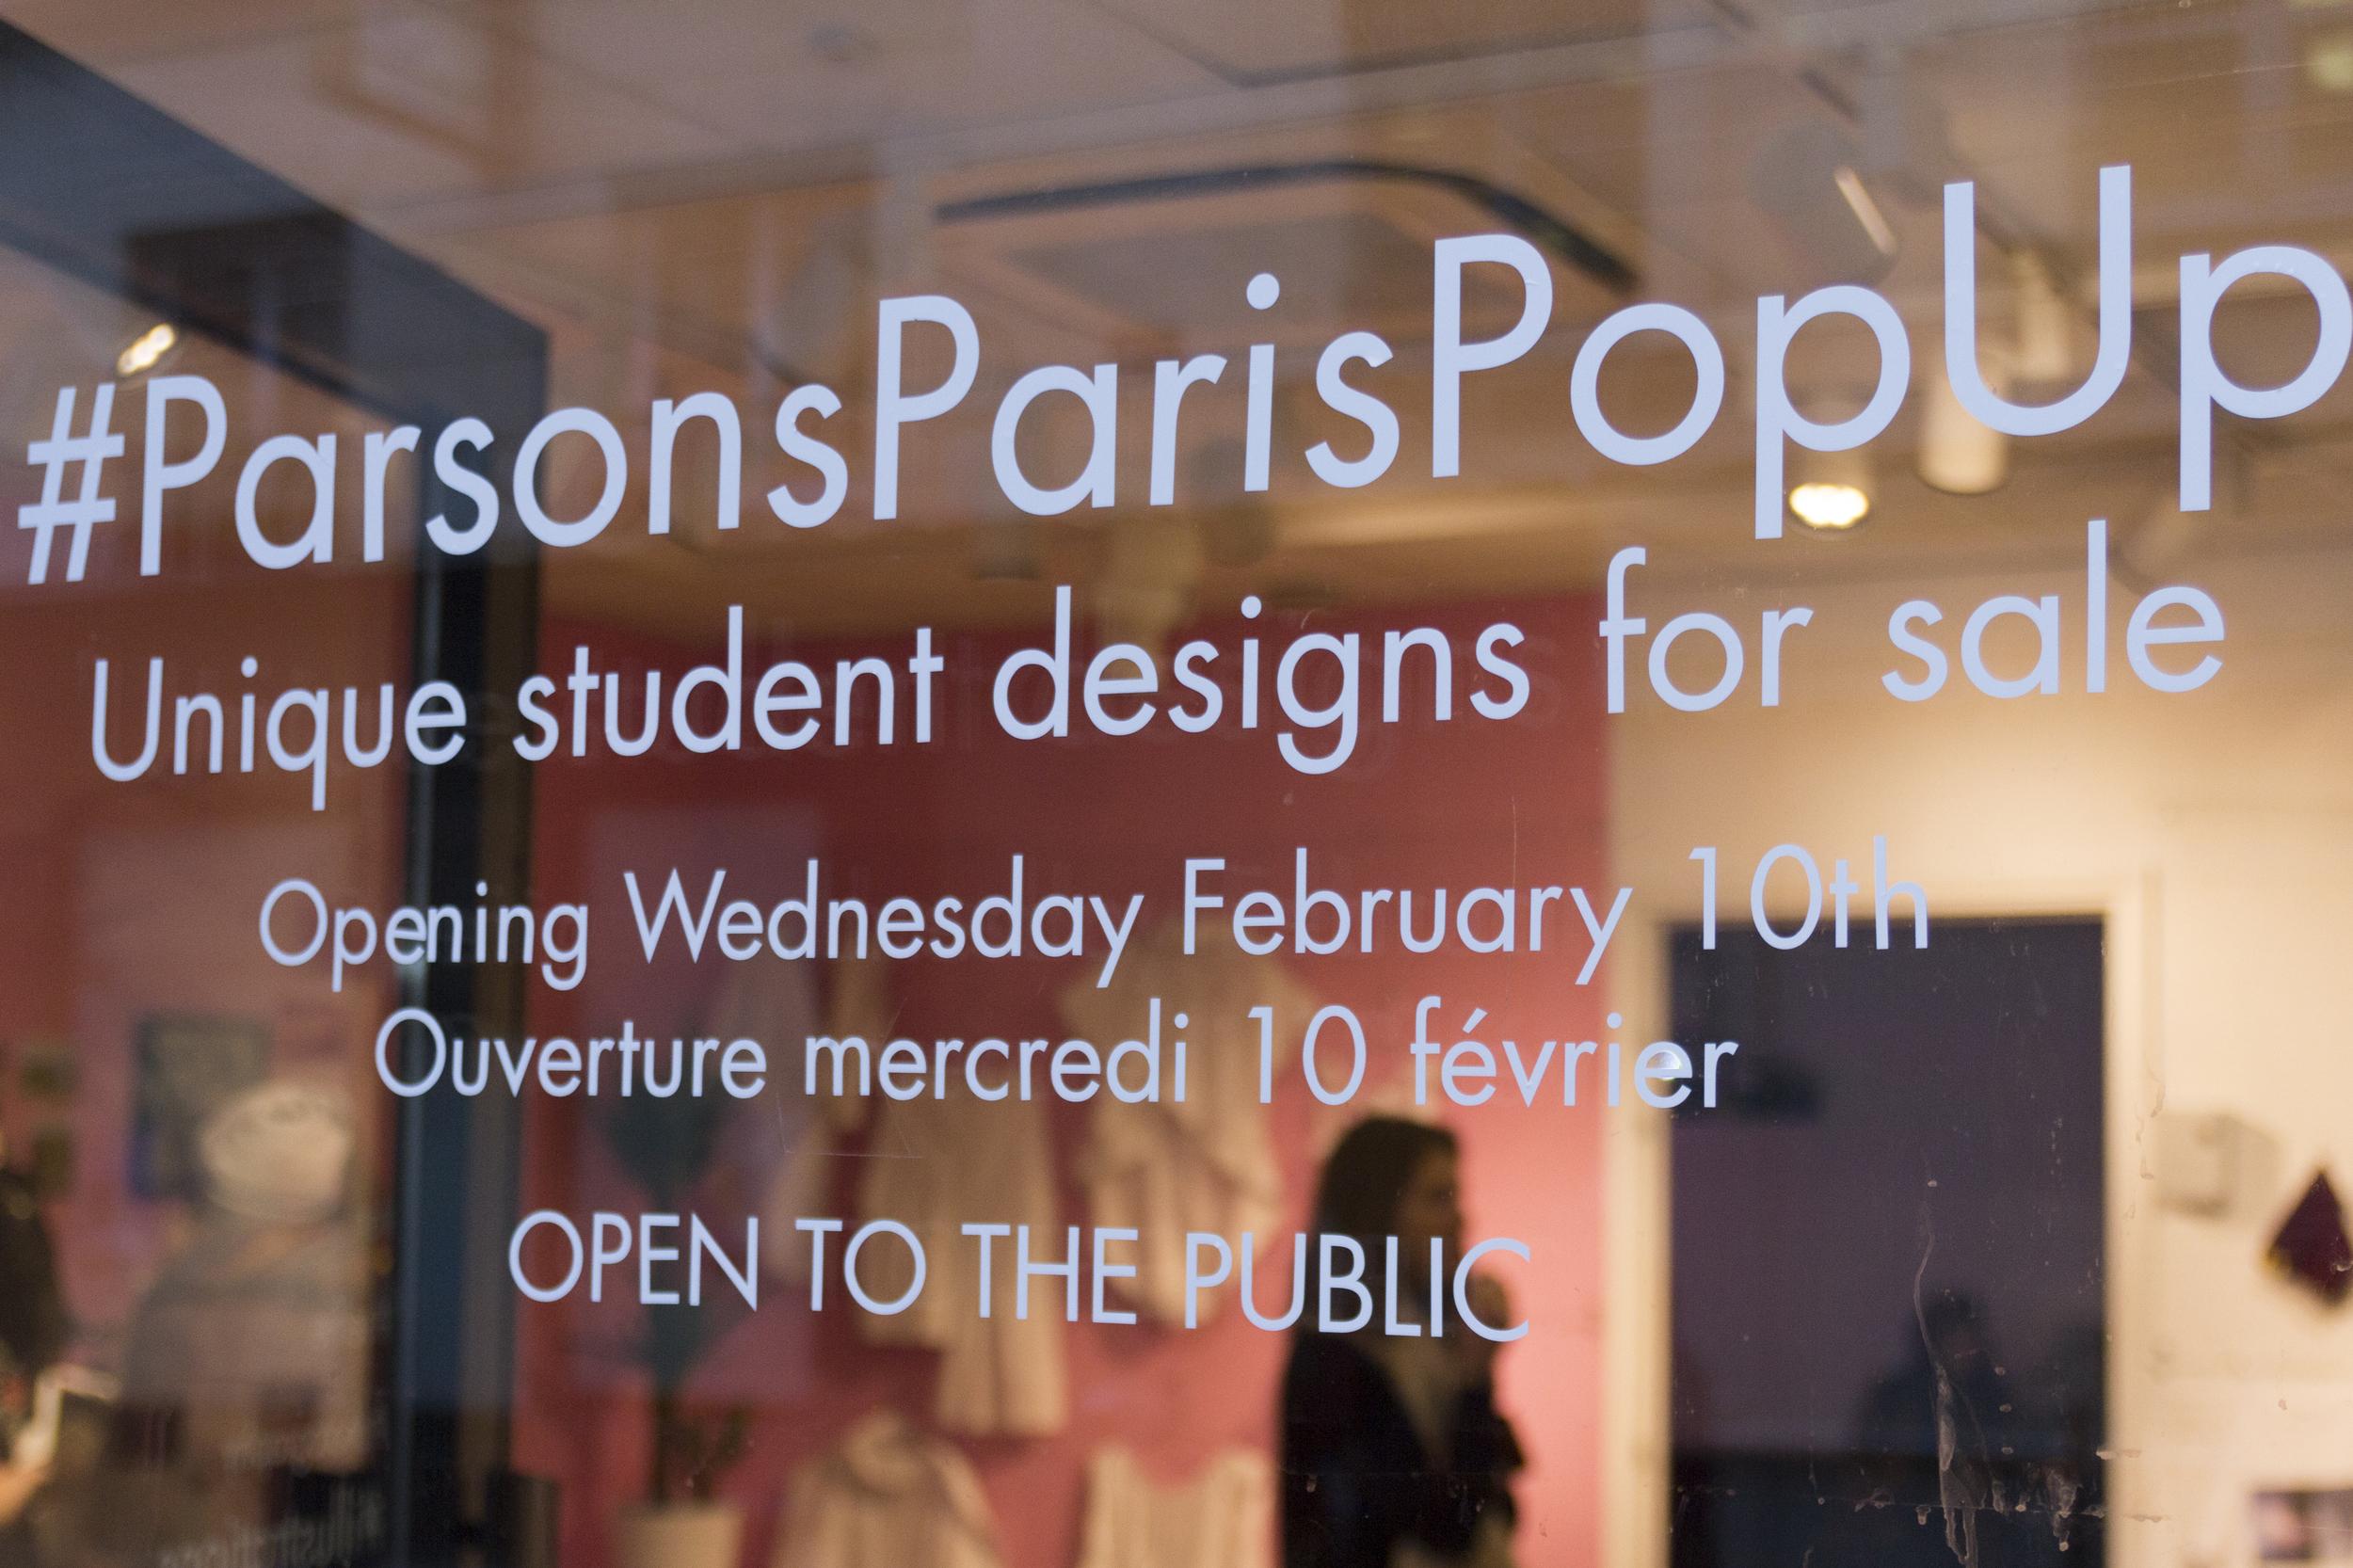 Parsons Paris Pop Up _February_2016_141.jpg